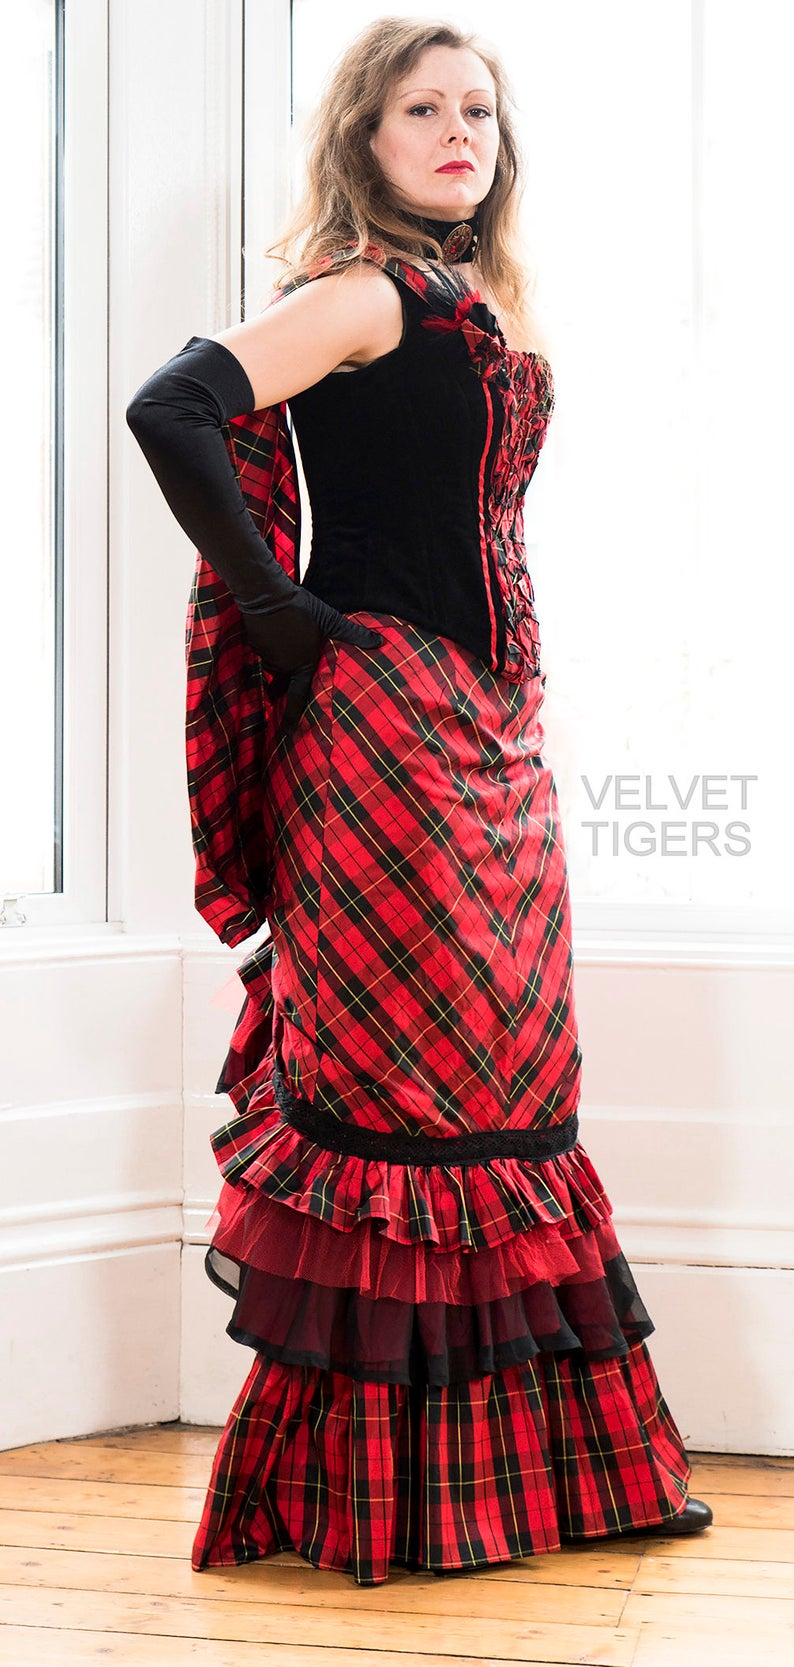 a5d3b206d49de Dress Alternative wedding or special occasion wear Victorian